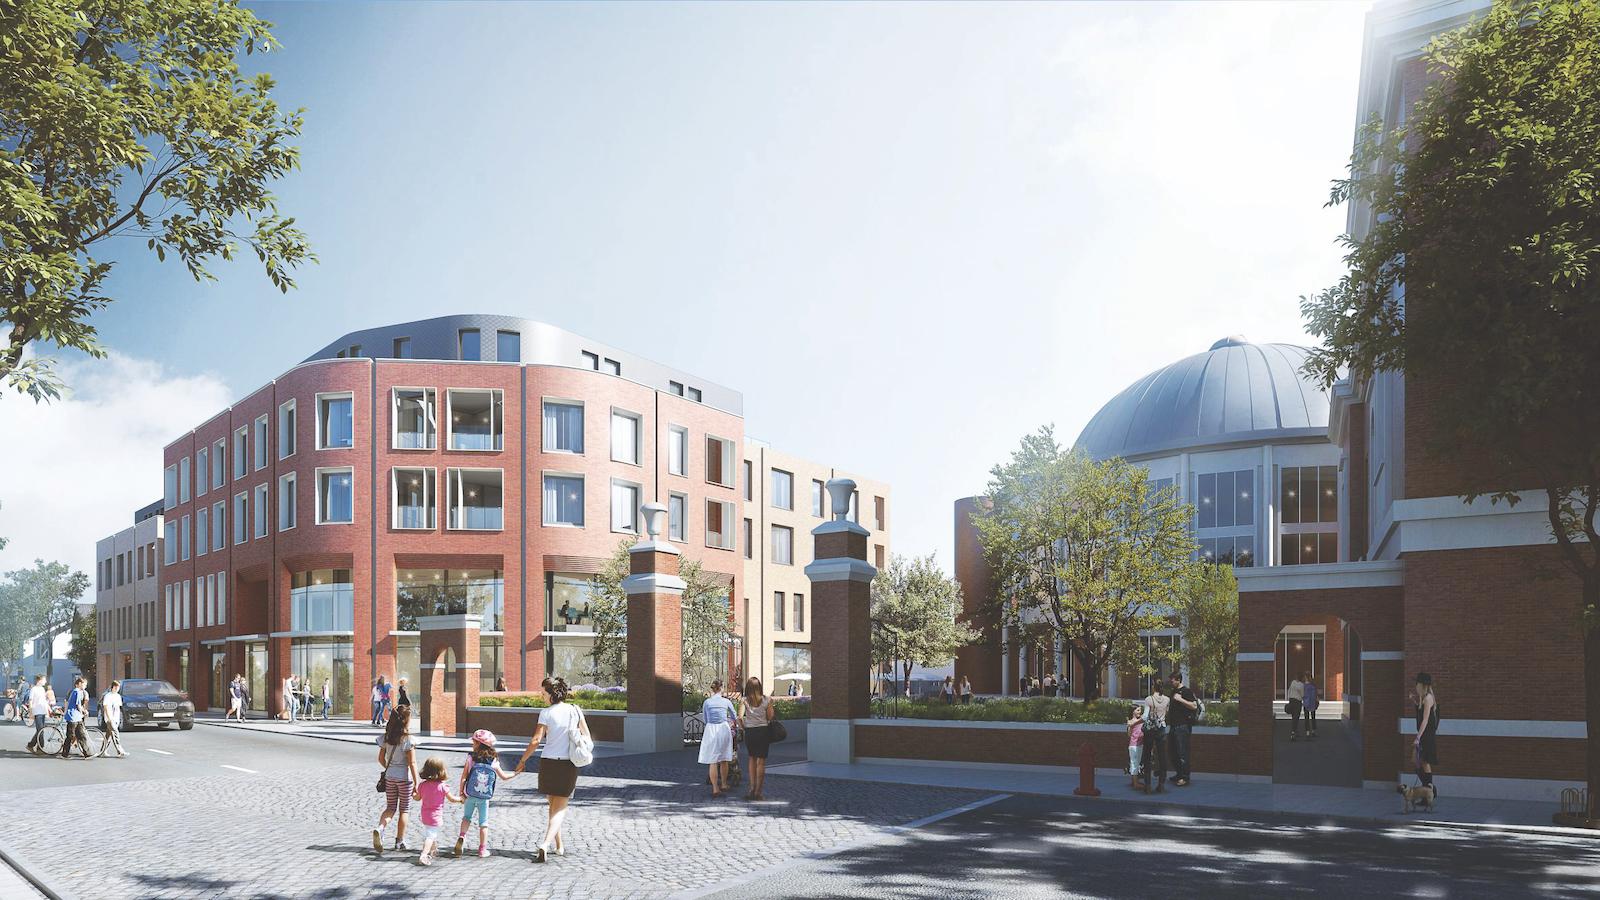 Braintree's Manor Street town centre regeneration